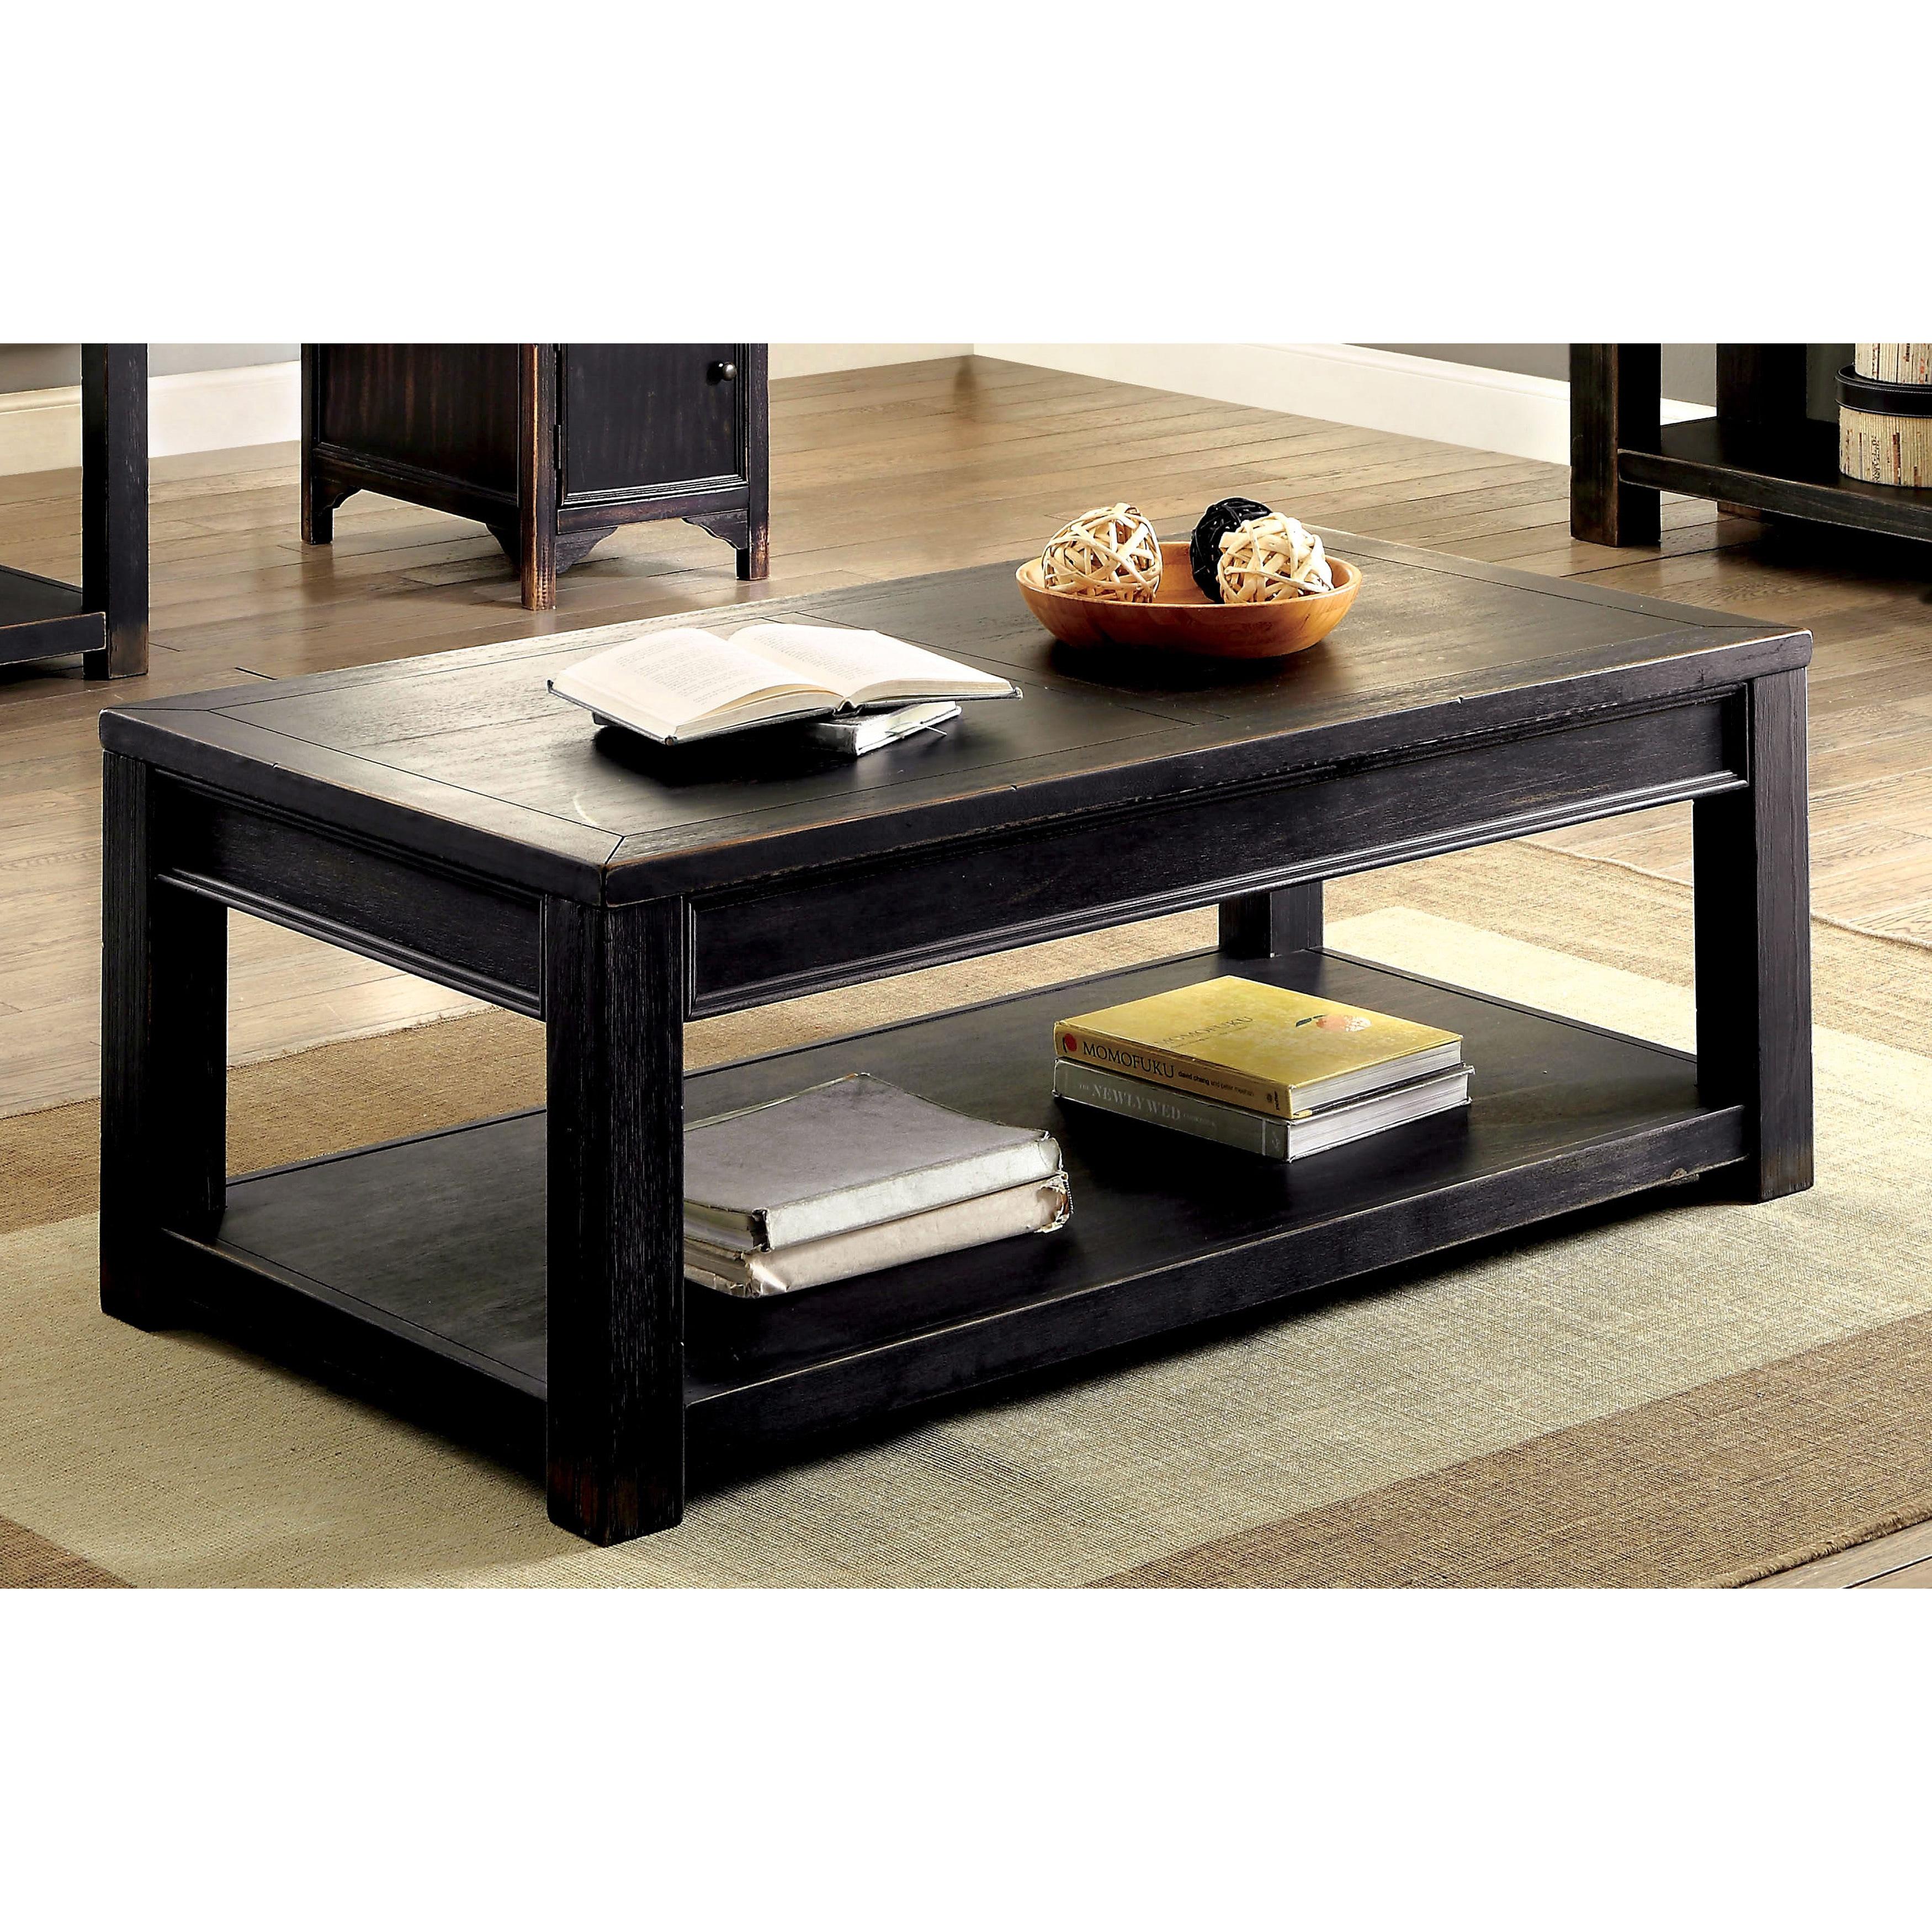 Furniture of America Cosbin Bold Antique Black Coffee Table Free